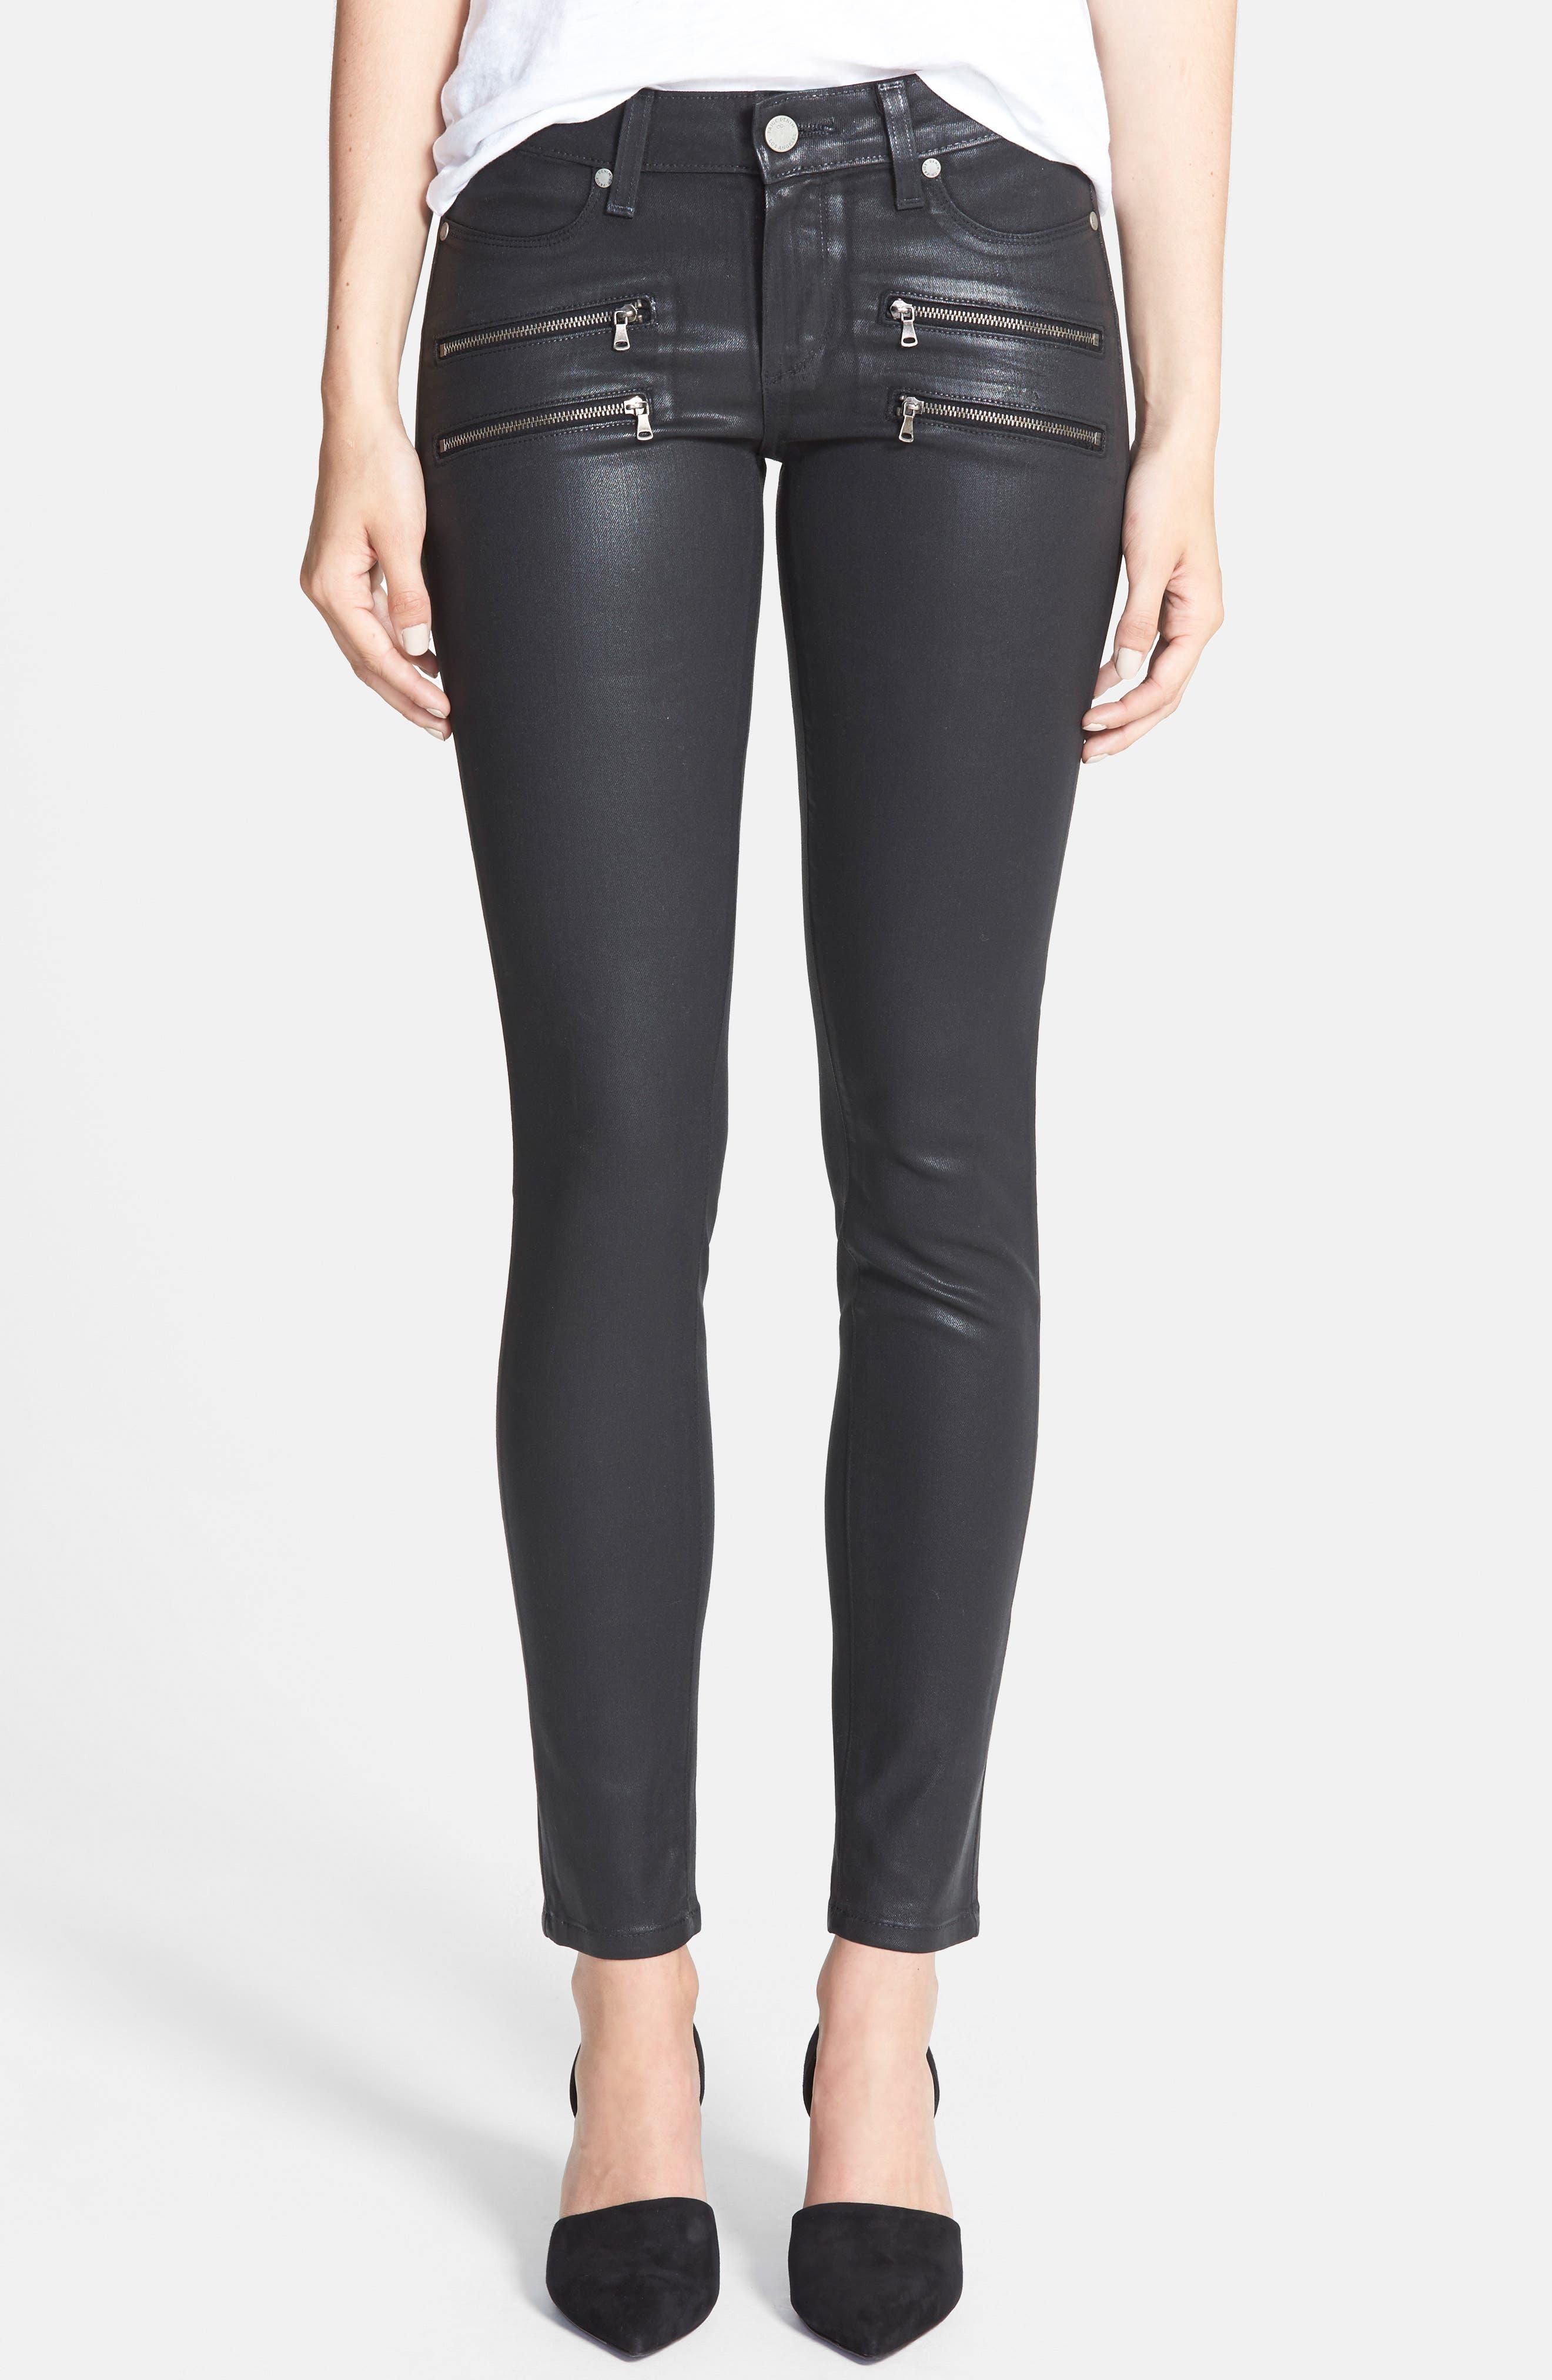 'Edgemont' Coated Ultra Skinny Jeans,                             Alternate thumbnail 6, color,                             001